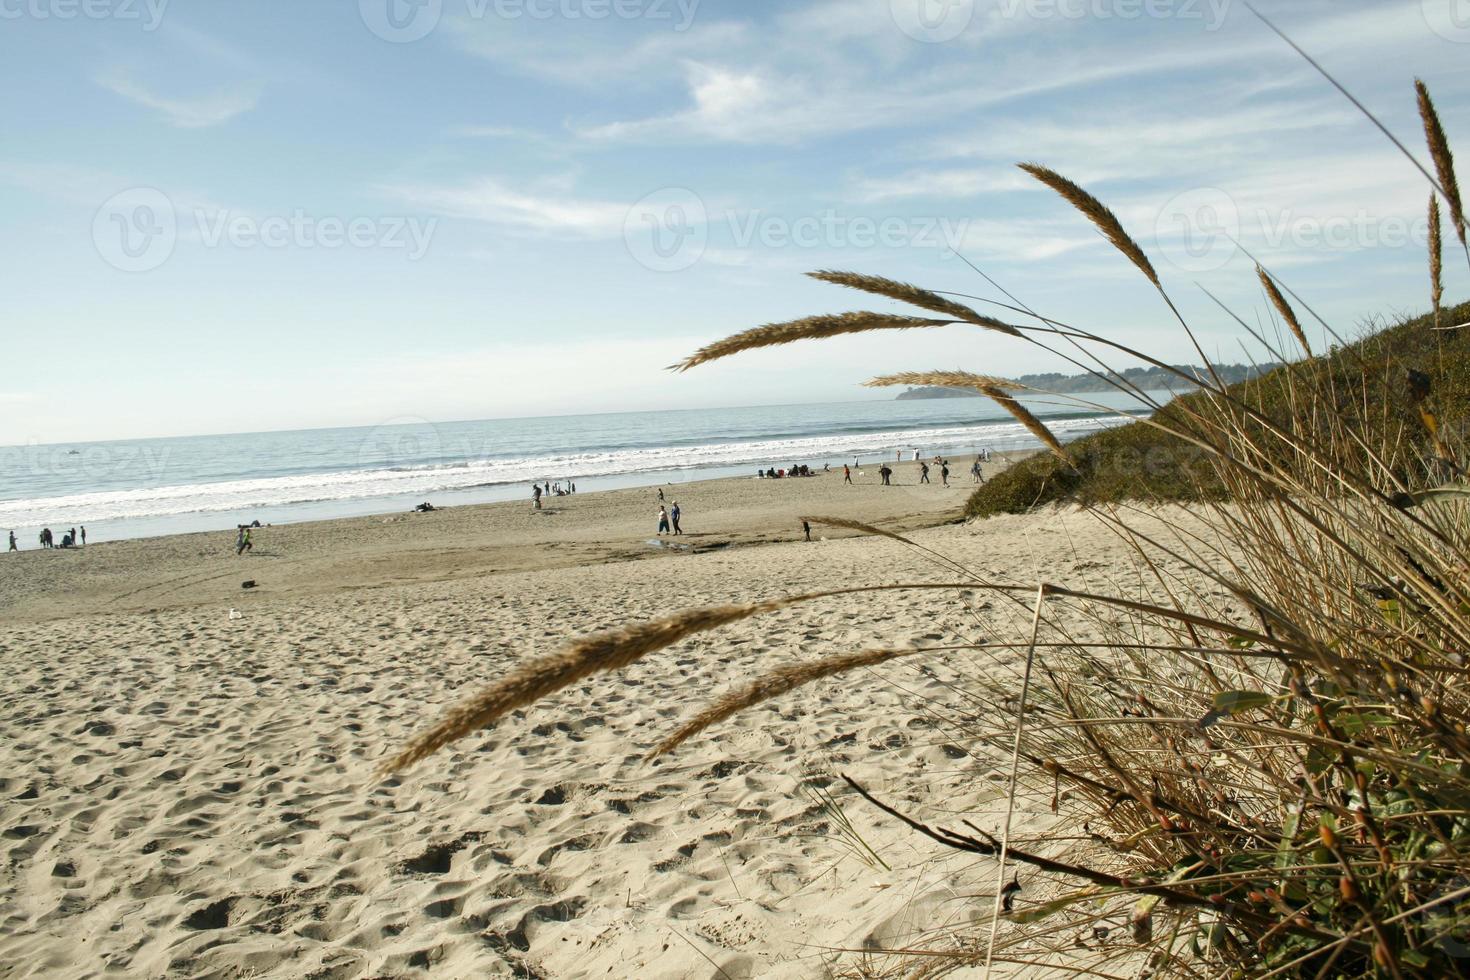 stinson beach - toerisme schot foto